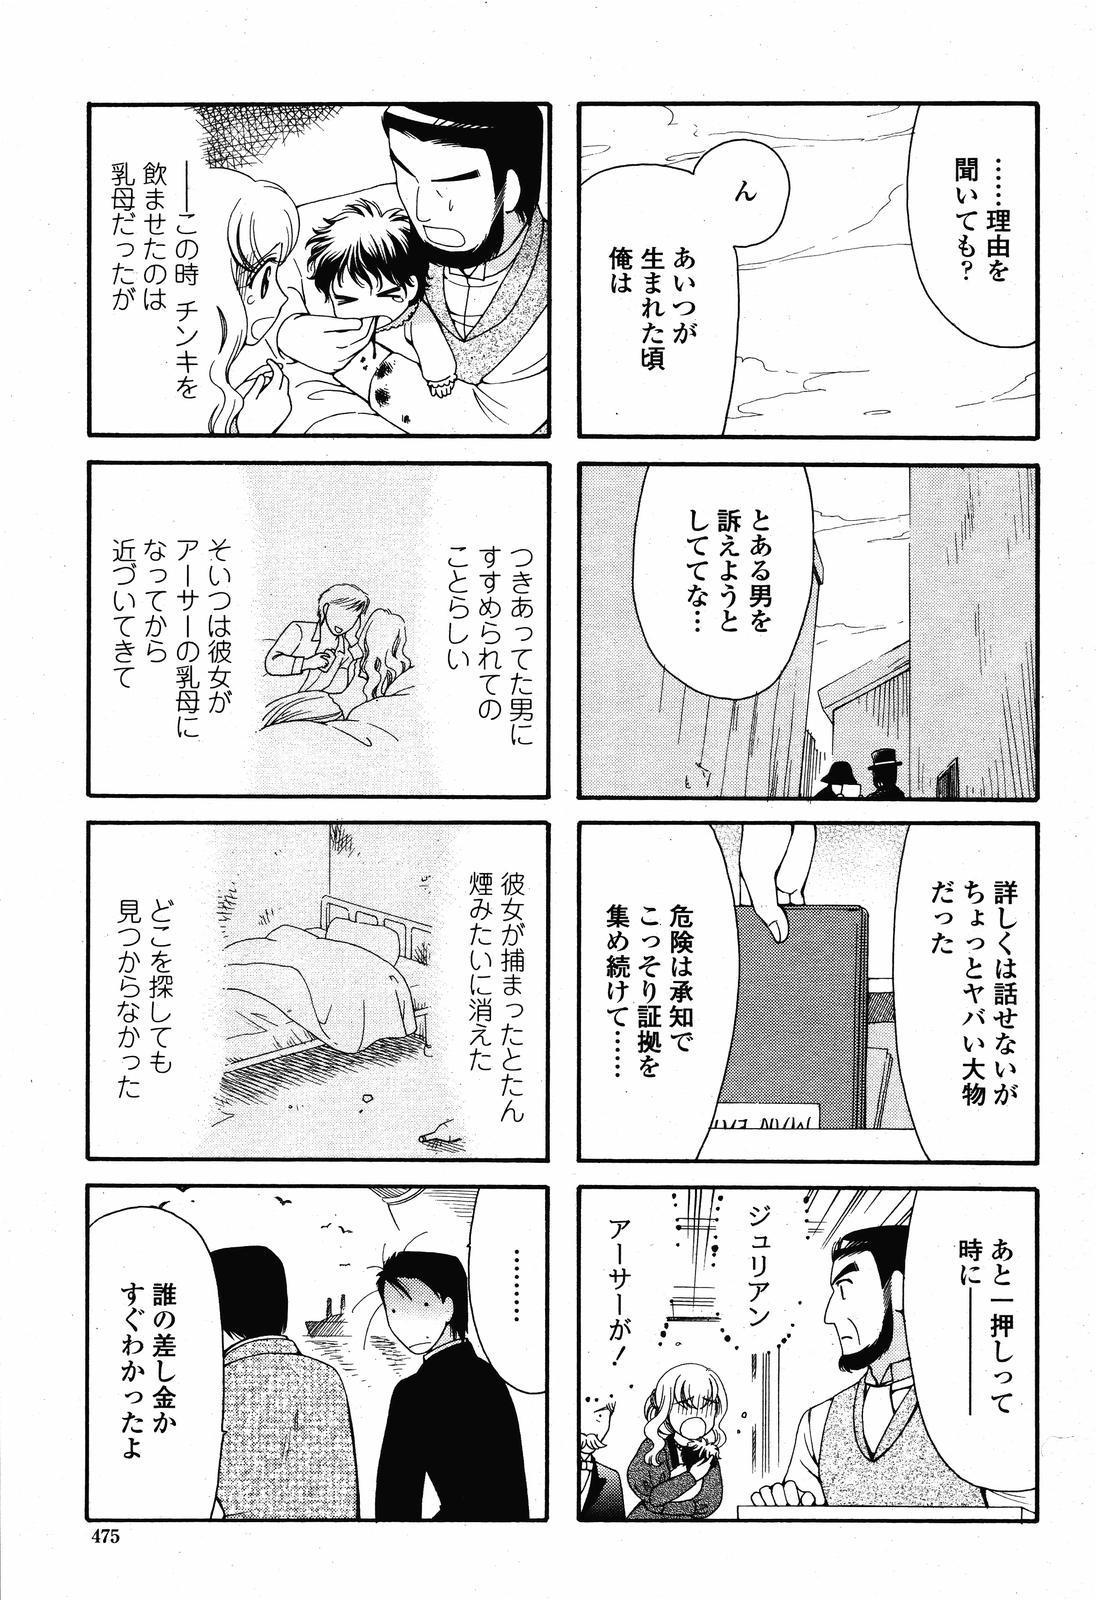 COMIC Momohime 2008-11 476